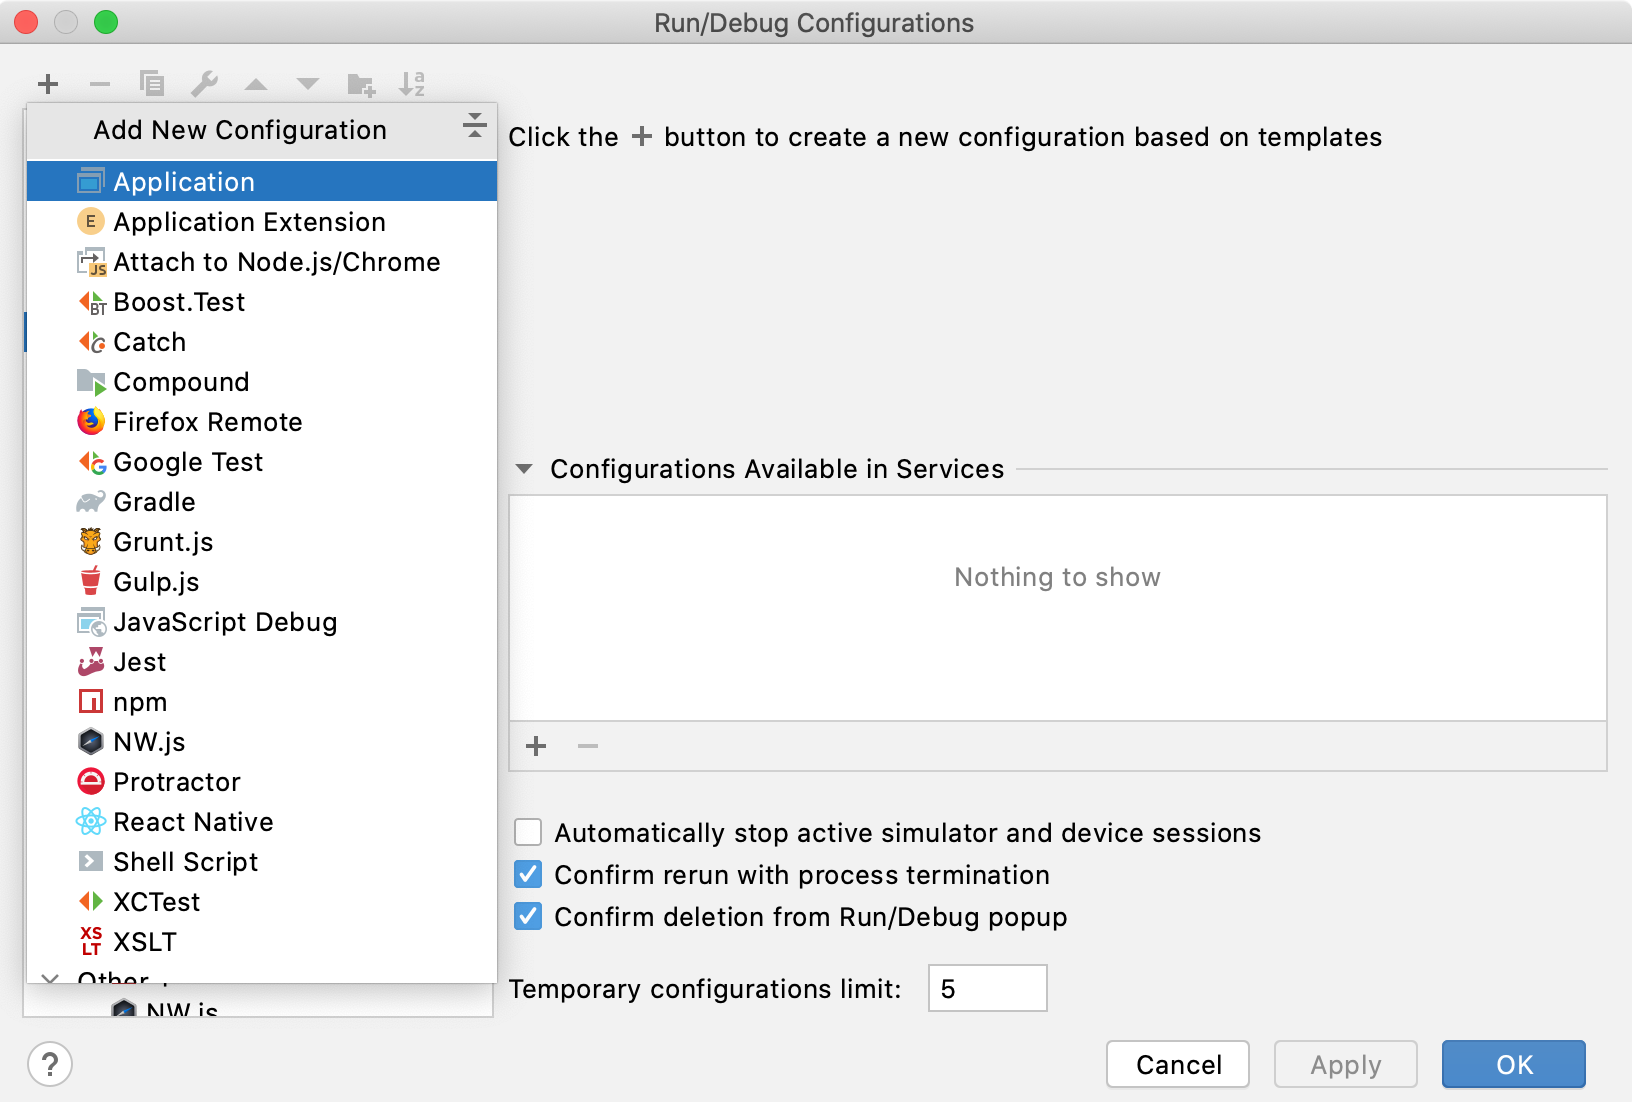 Selecting a new run/debug configuration template